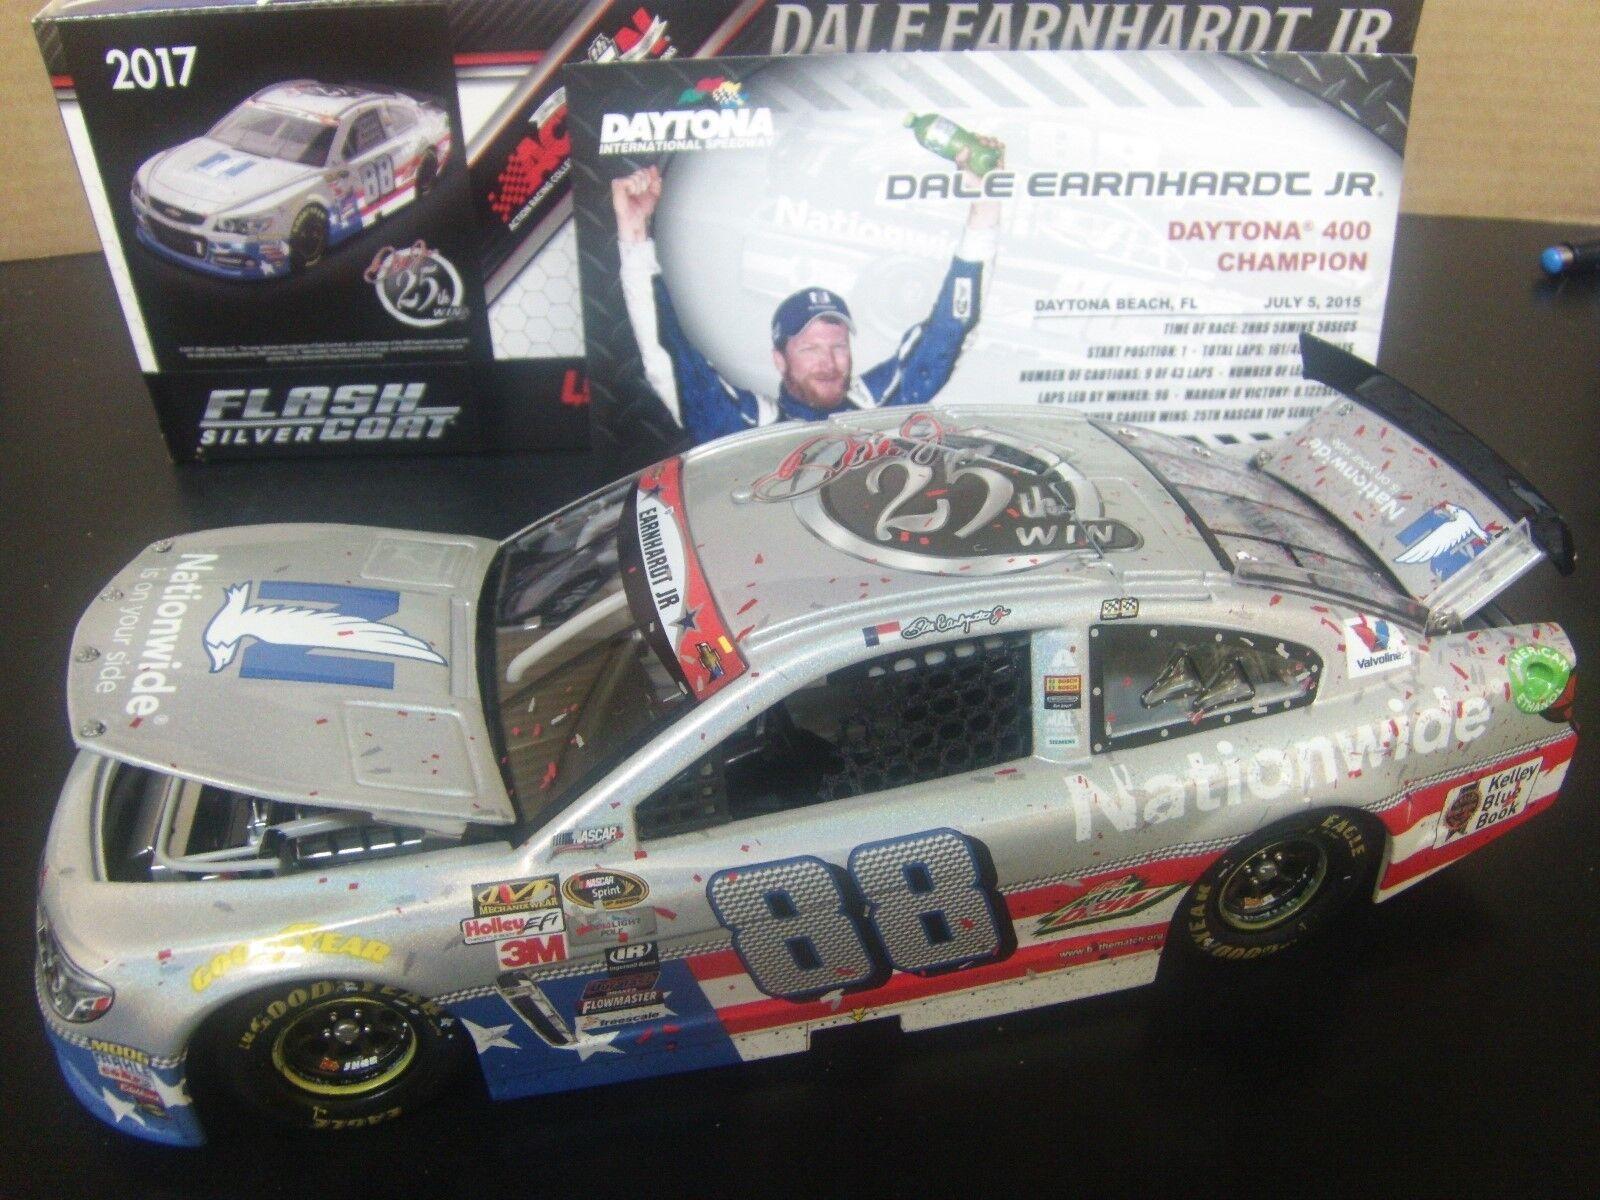 Dale Earnhardt Jr  Daytona Coke 400  25th Career Win 1 24 Flashcoat NASCAR